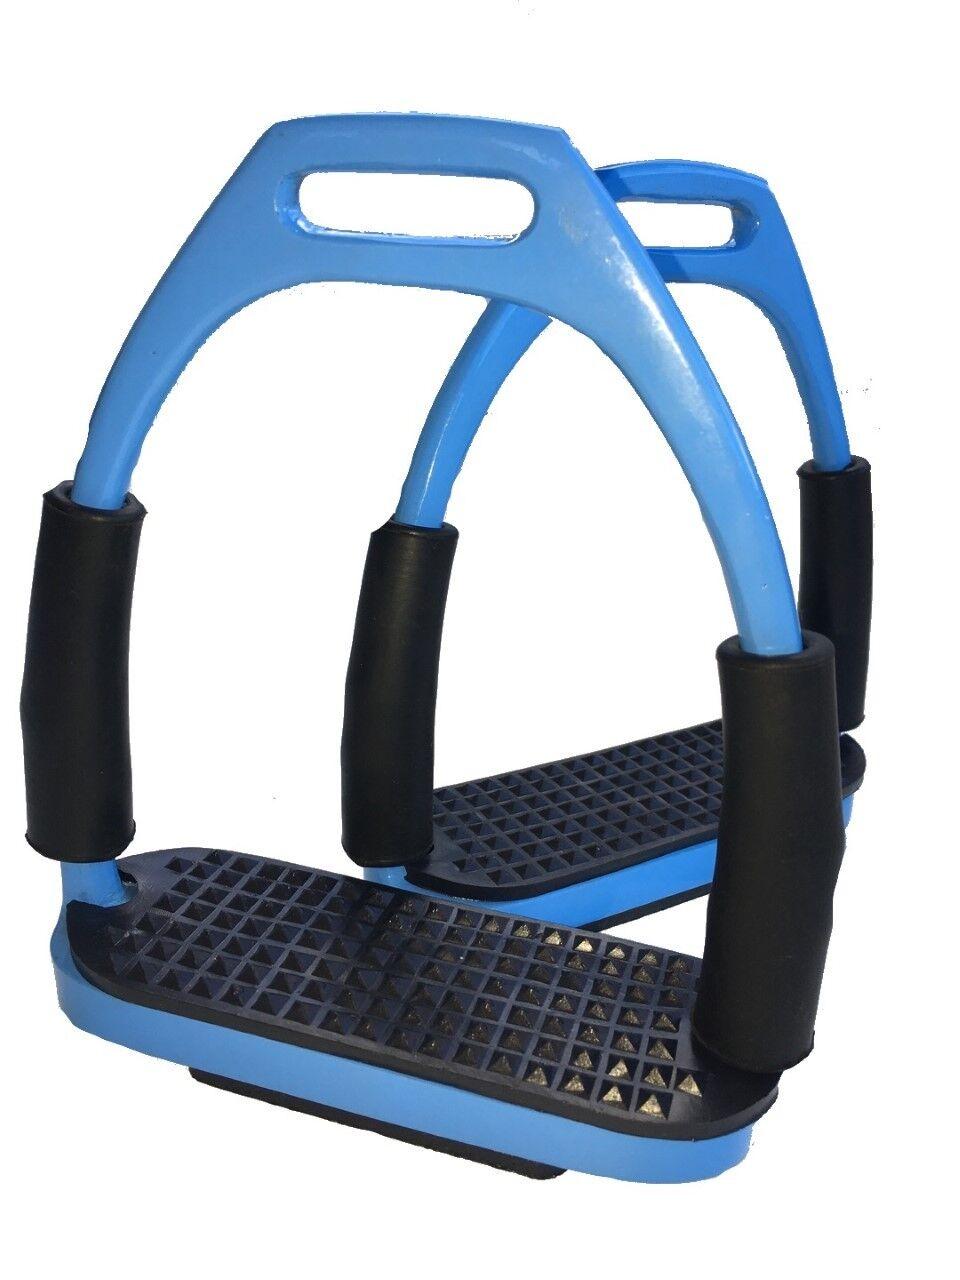 Stirrups  Sky bluee Flexi Stirrups Stainless Steel bluee Safety Stirrups  the best after-sale service